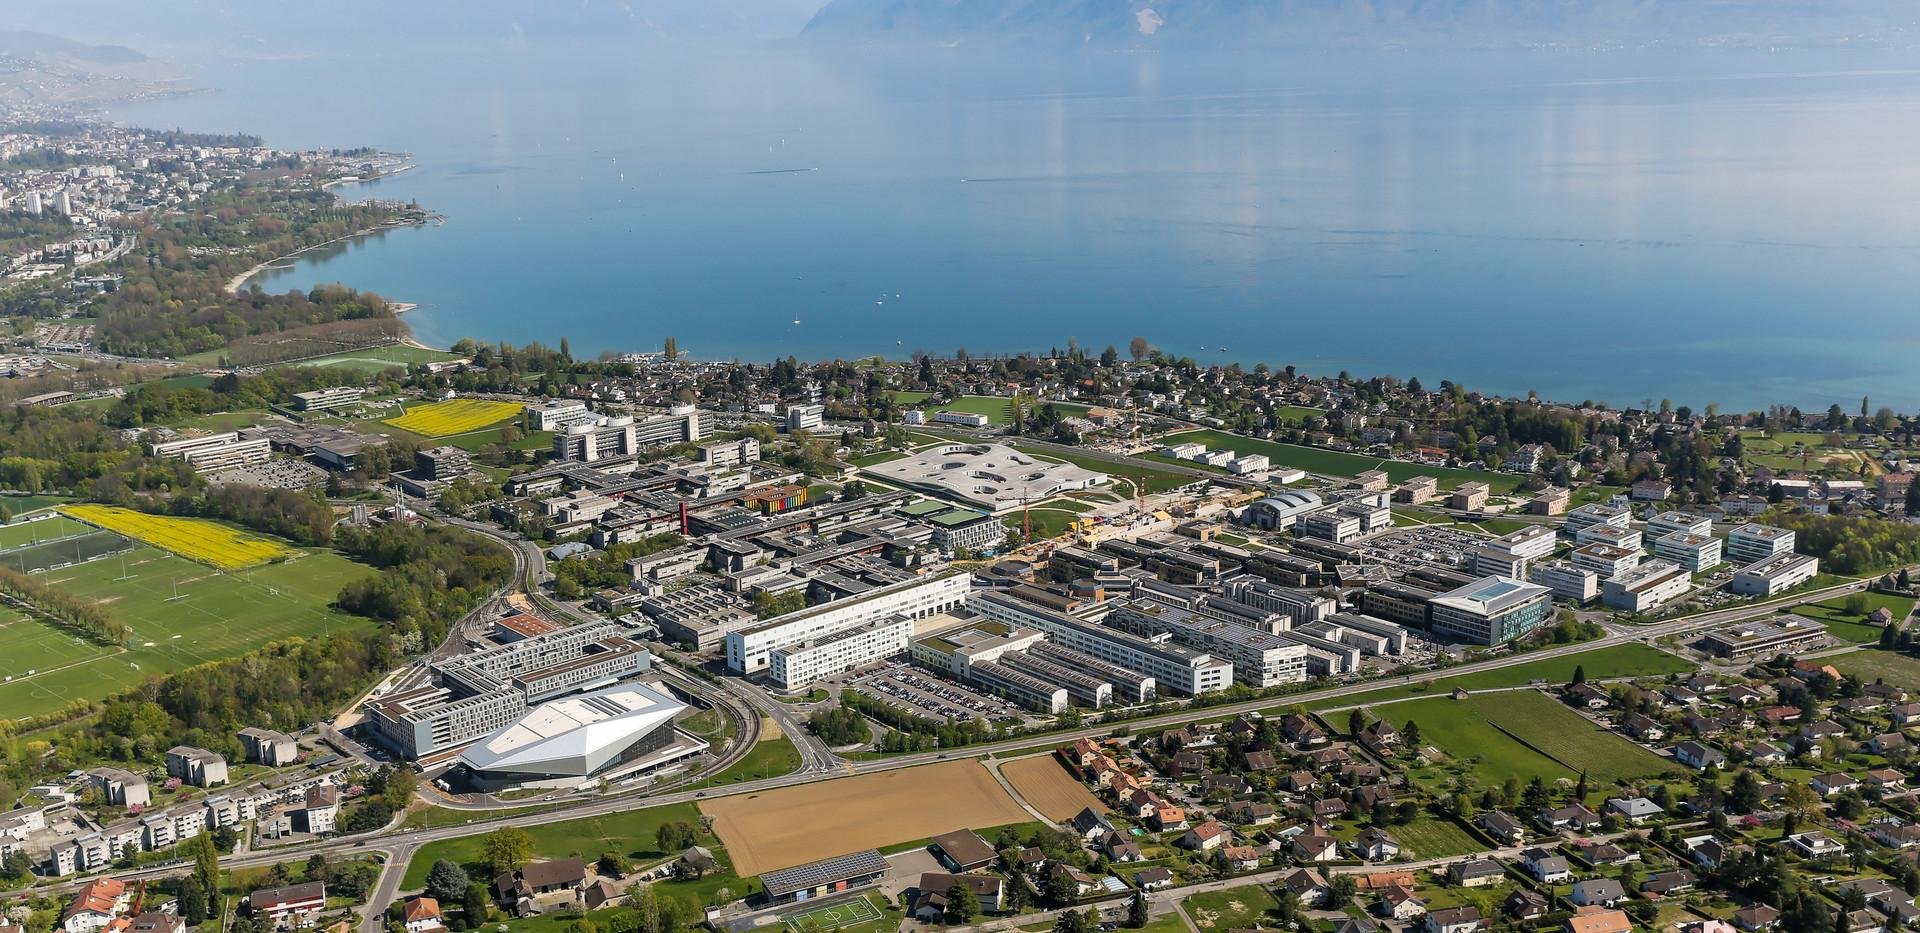 SwissTech_Convention_Heli_copyright_Alai